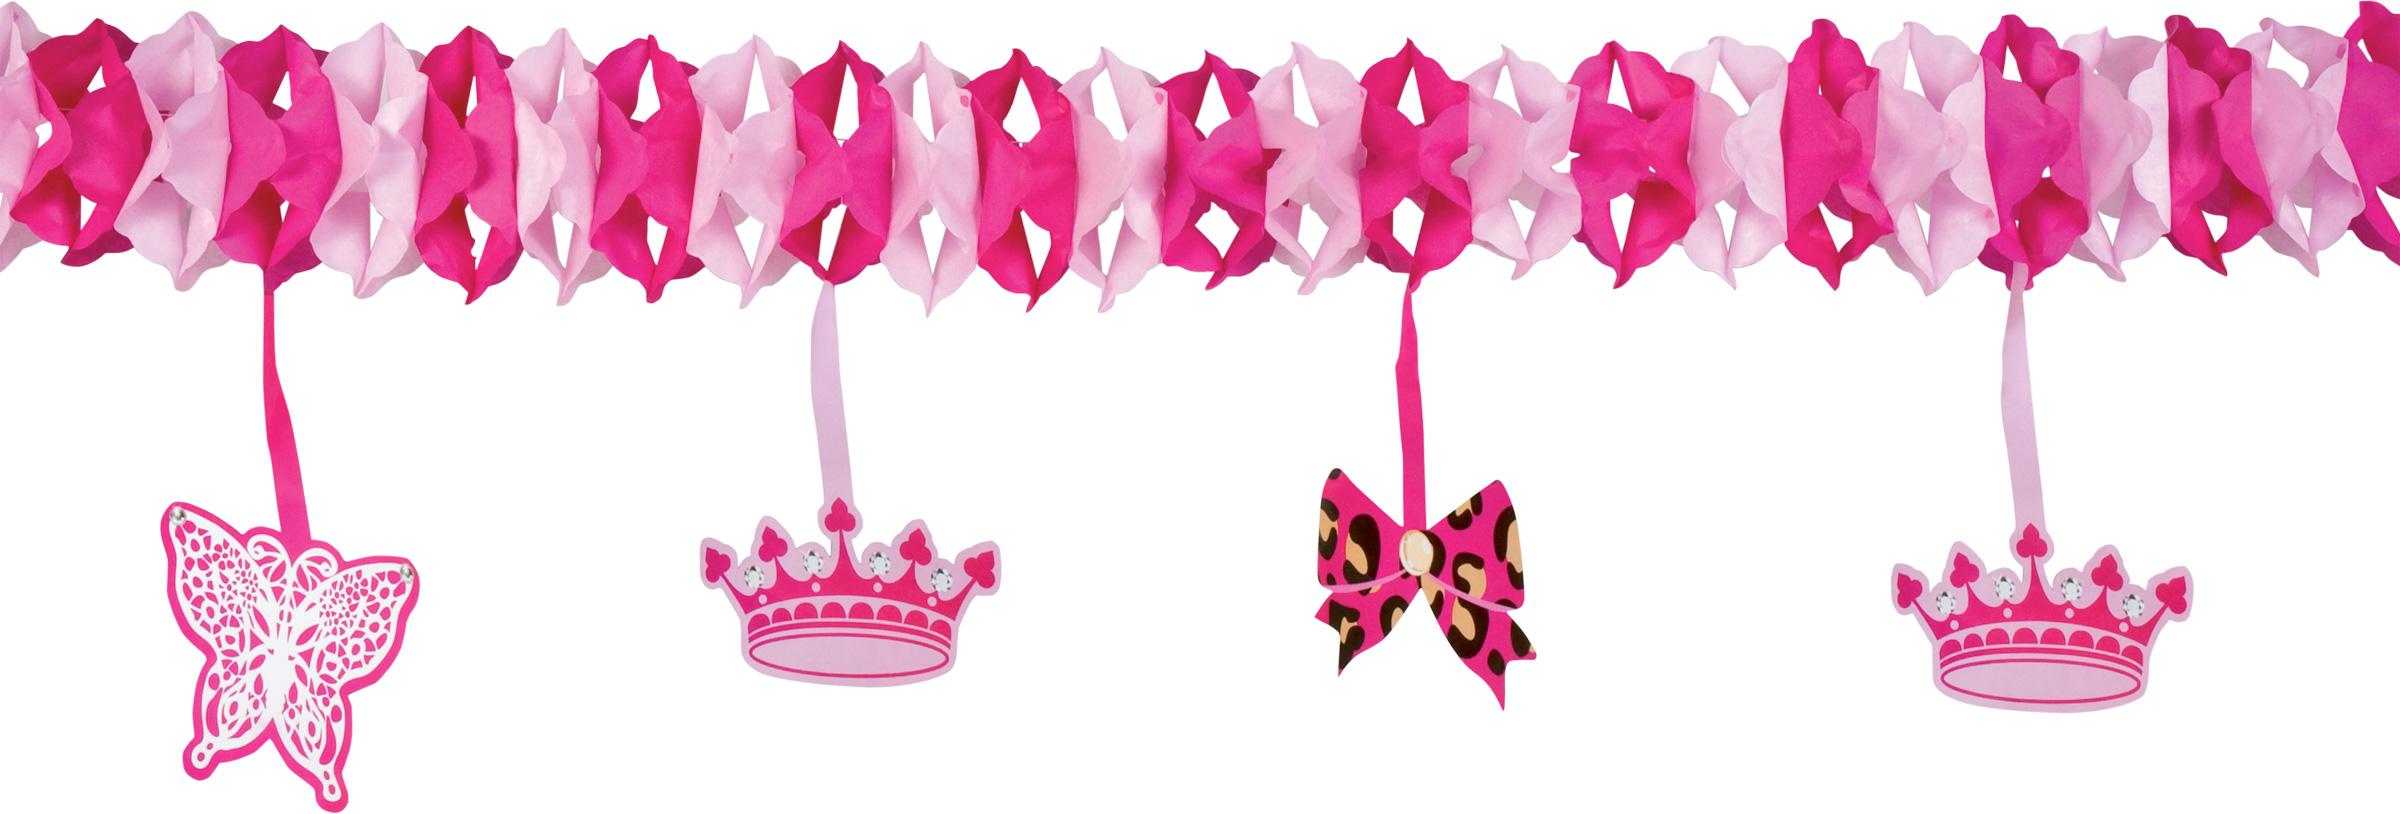 prinzessinnen girlande party deko rosa pink 4m g nstige faschings partydeko zubeh r bei. Black Bedroom Furniture Sets. Home Design Ideas